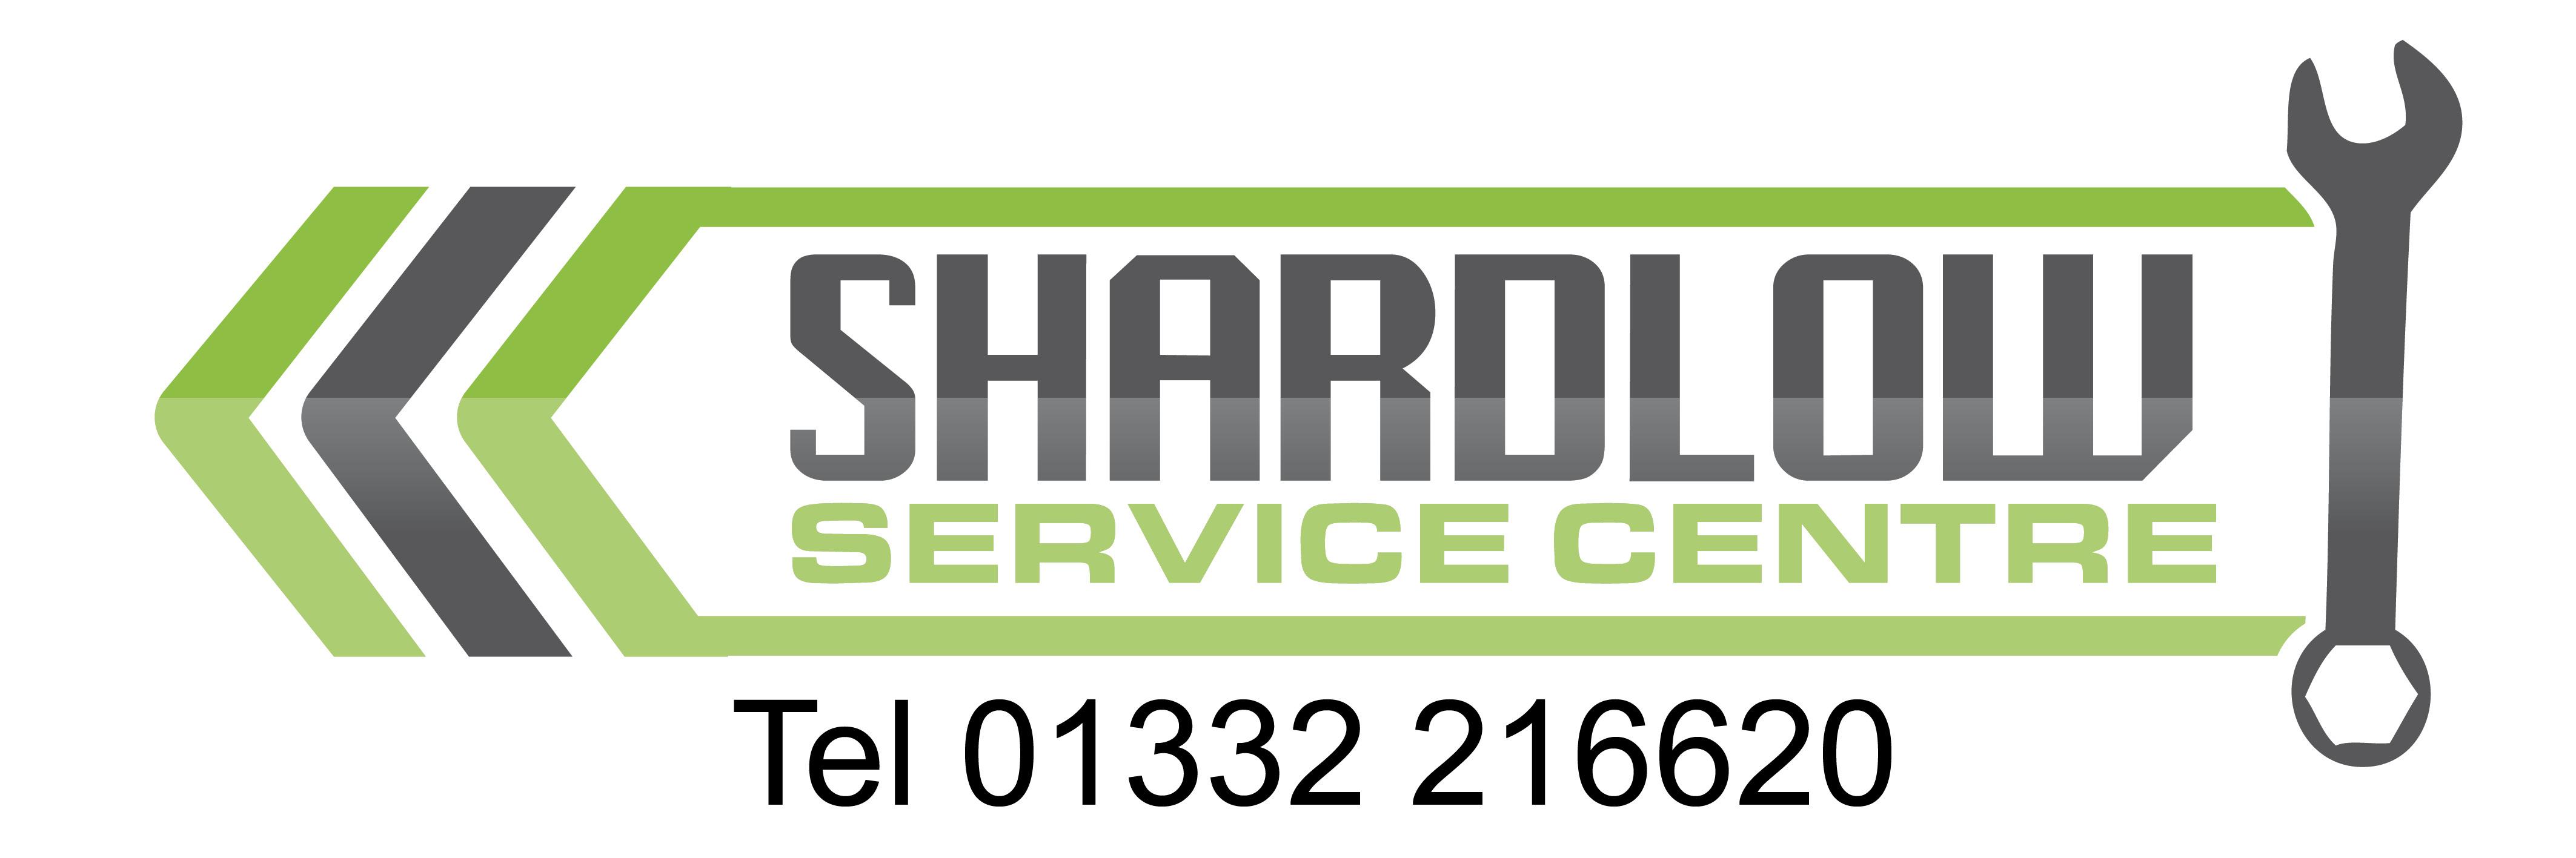 Shardlow Service Centre